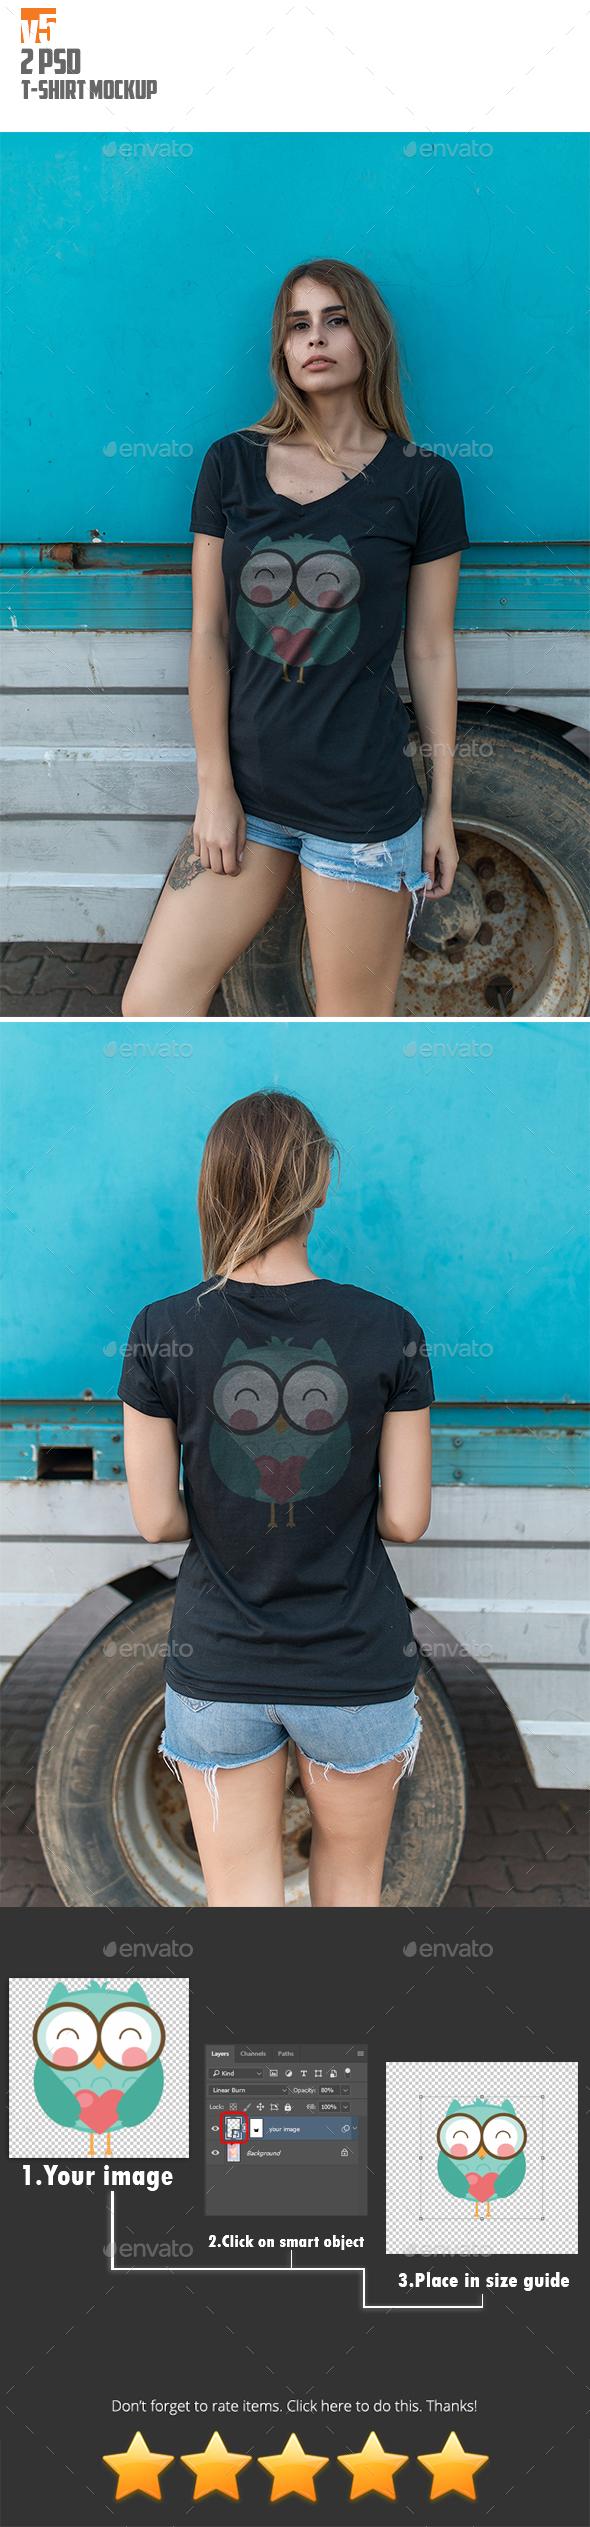 T-Shirt Mockup v5 - T-shirts Apparel